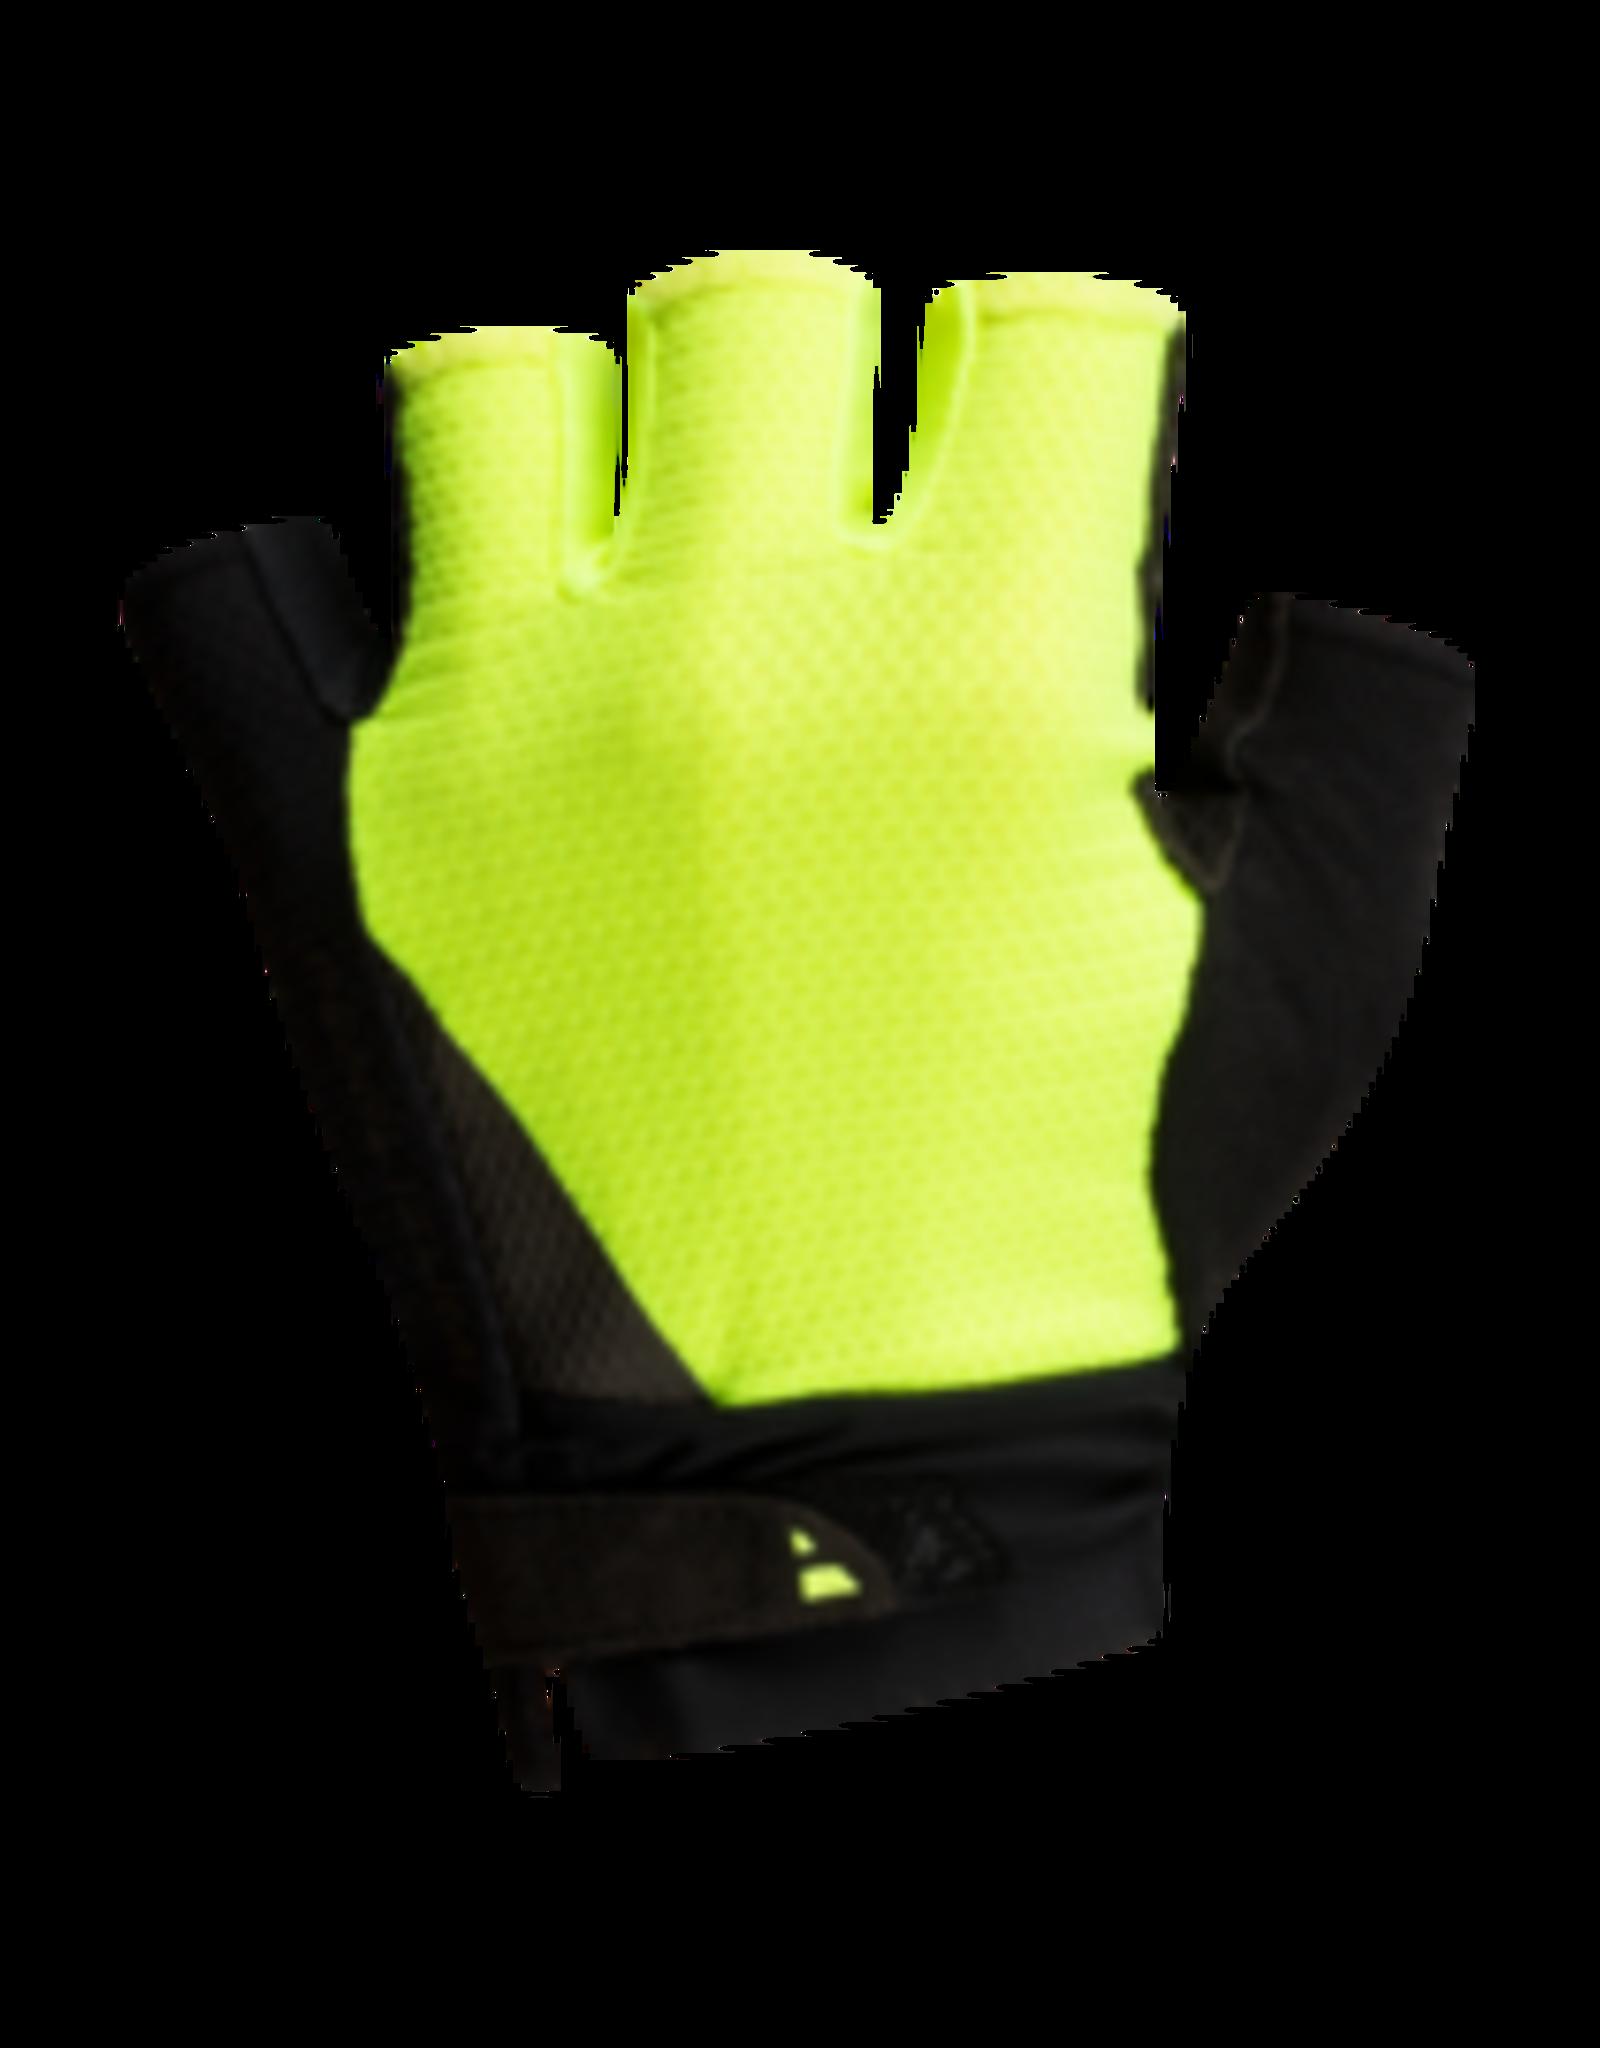 Pearl Izumi Pearl Izumi Elite Gel Glove MD Screaming Yellow